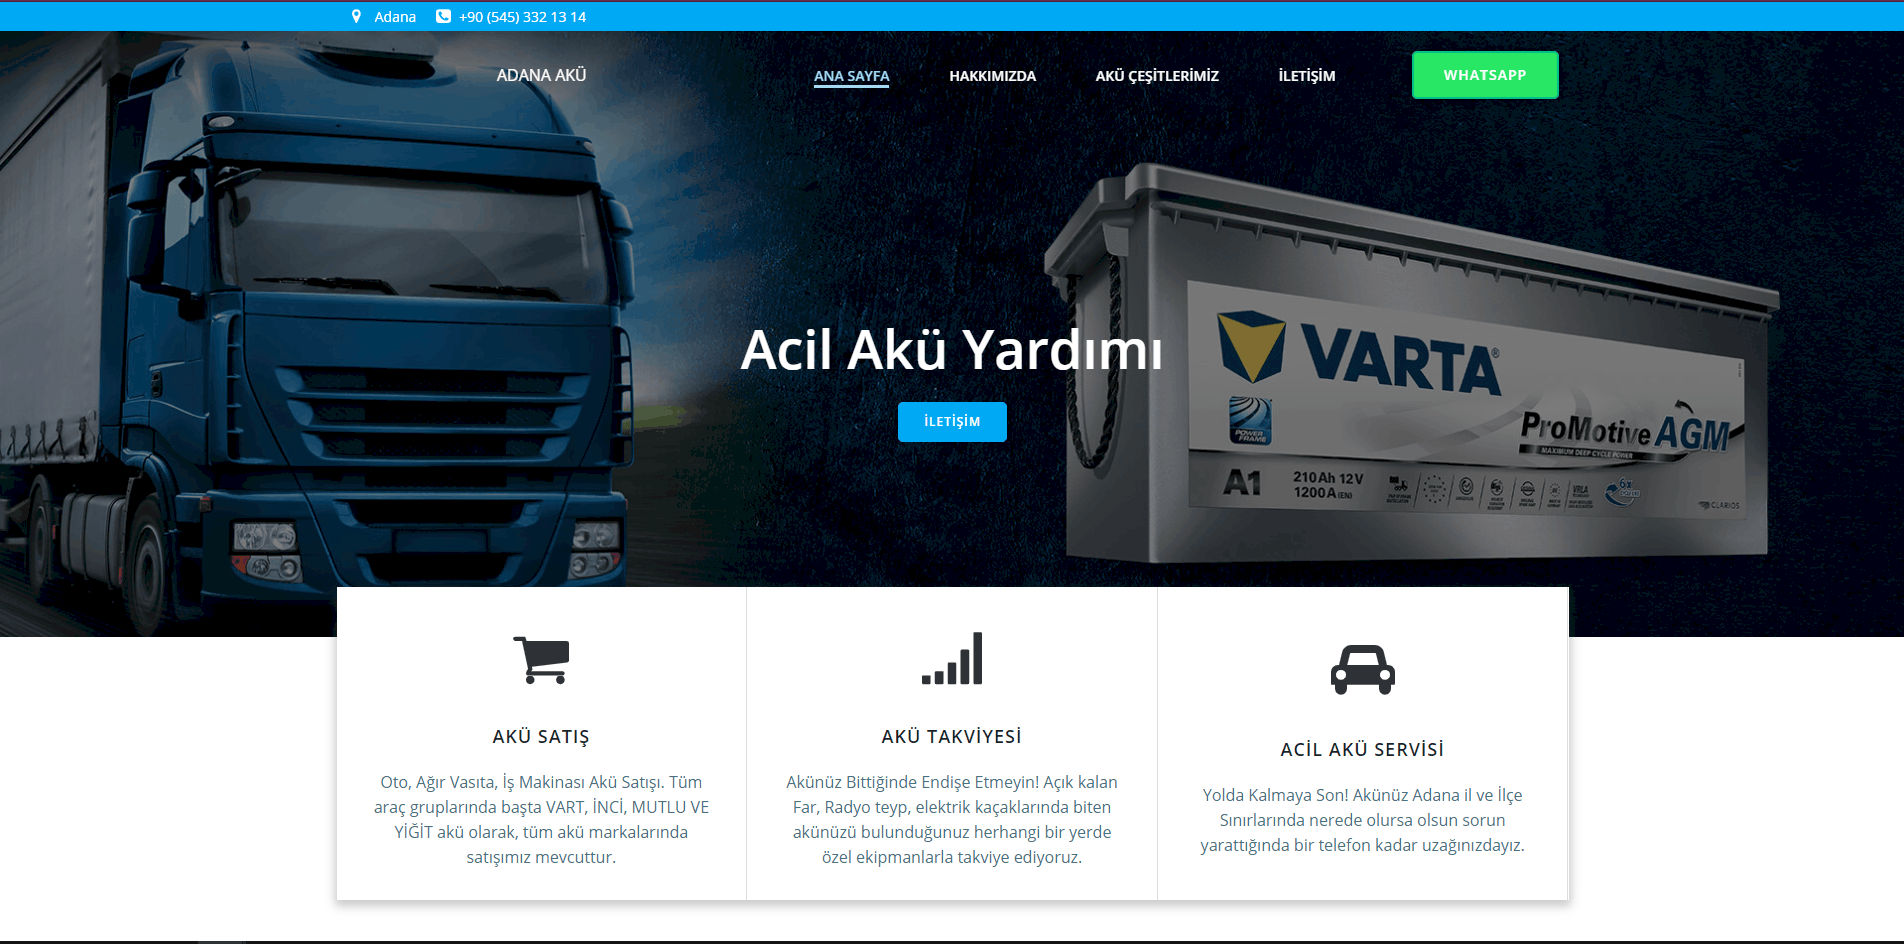 adanaakucu.com